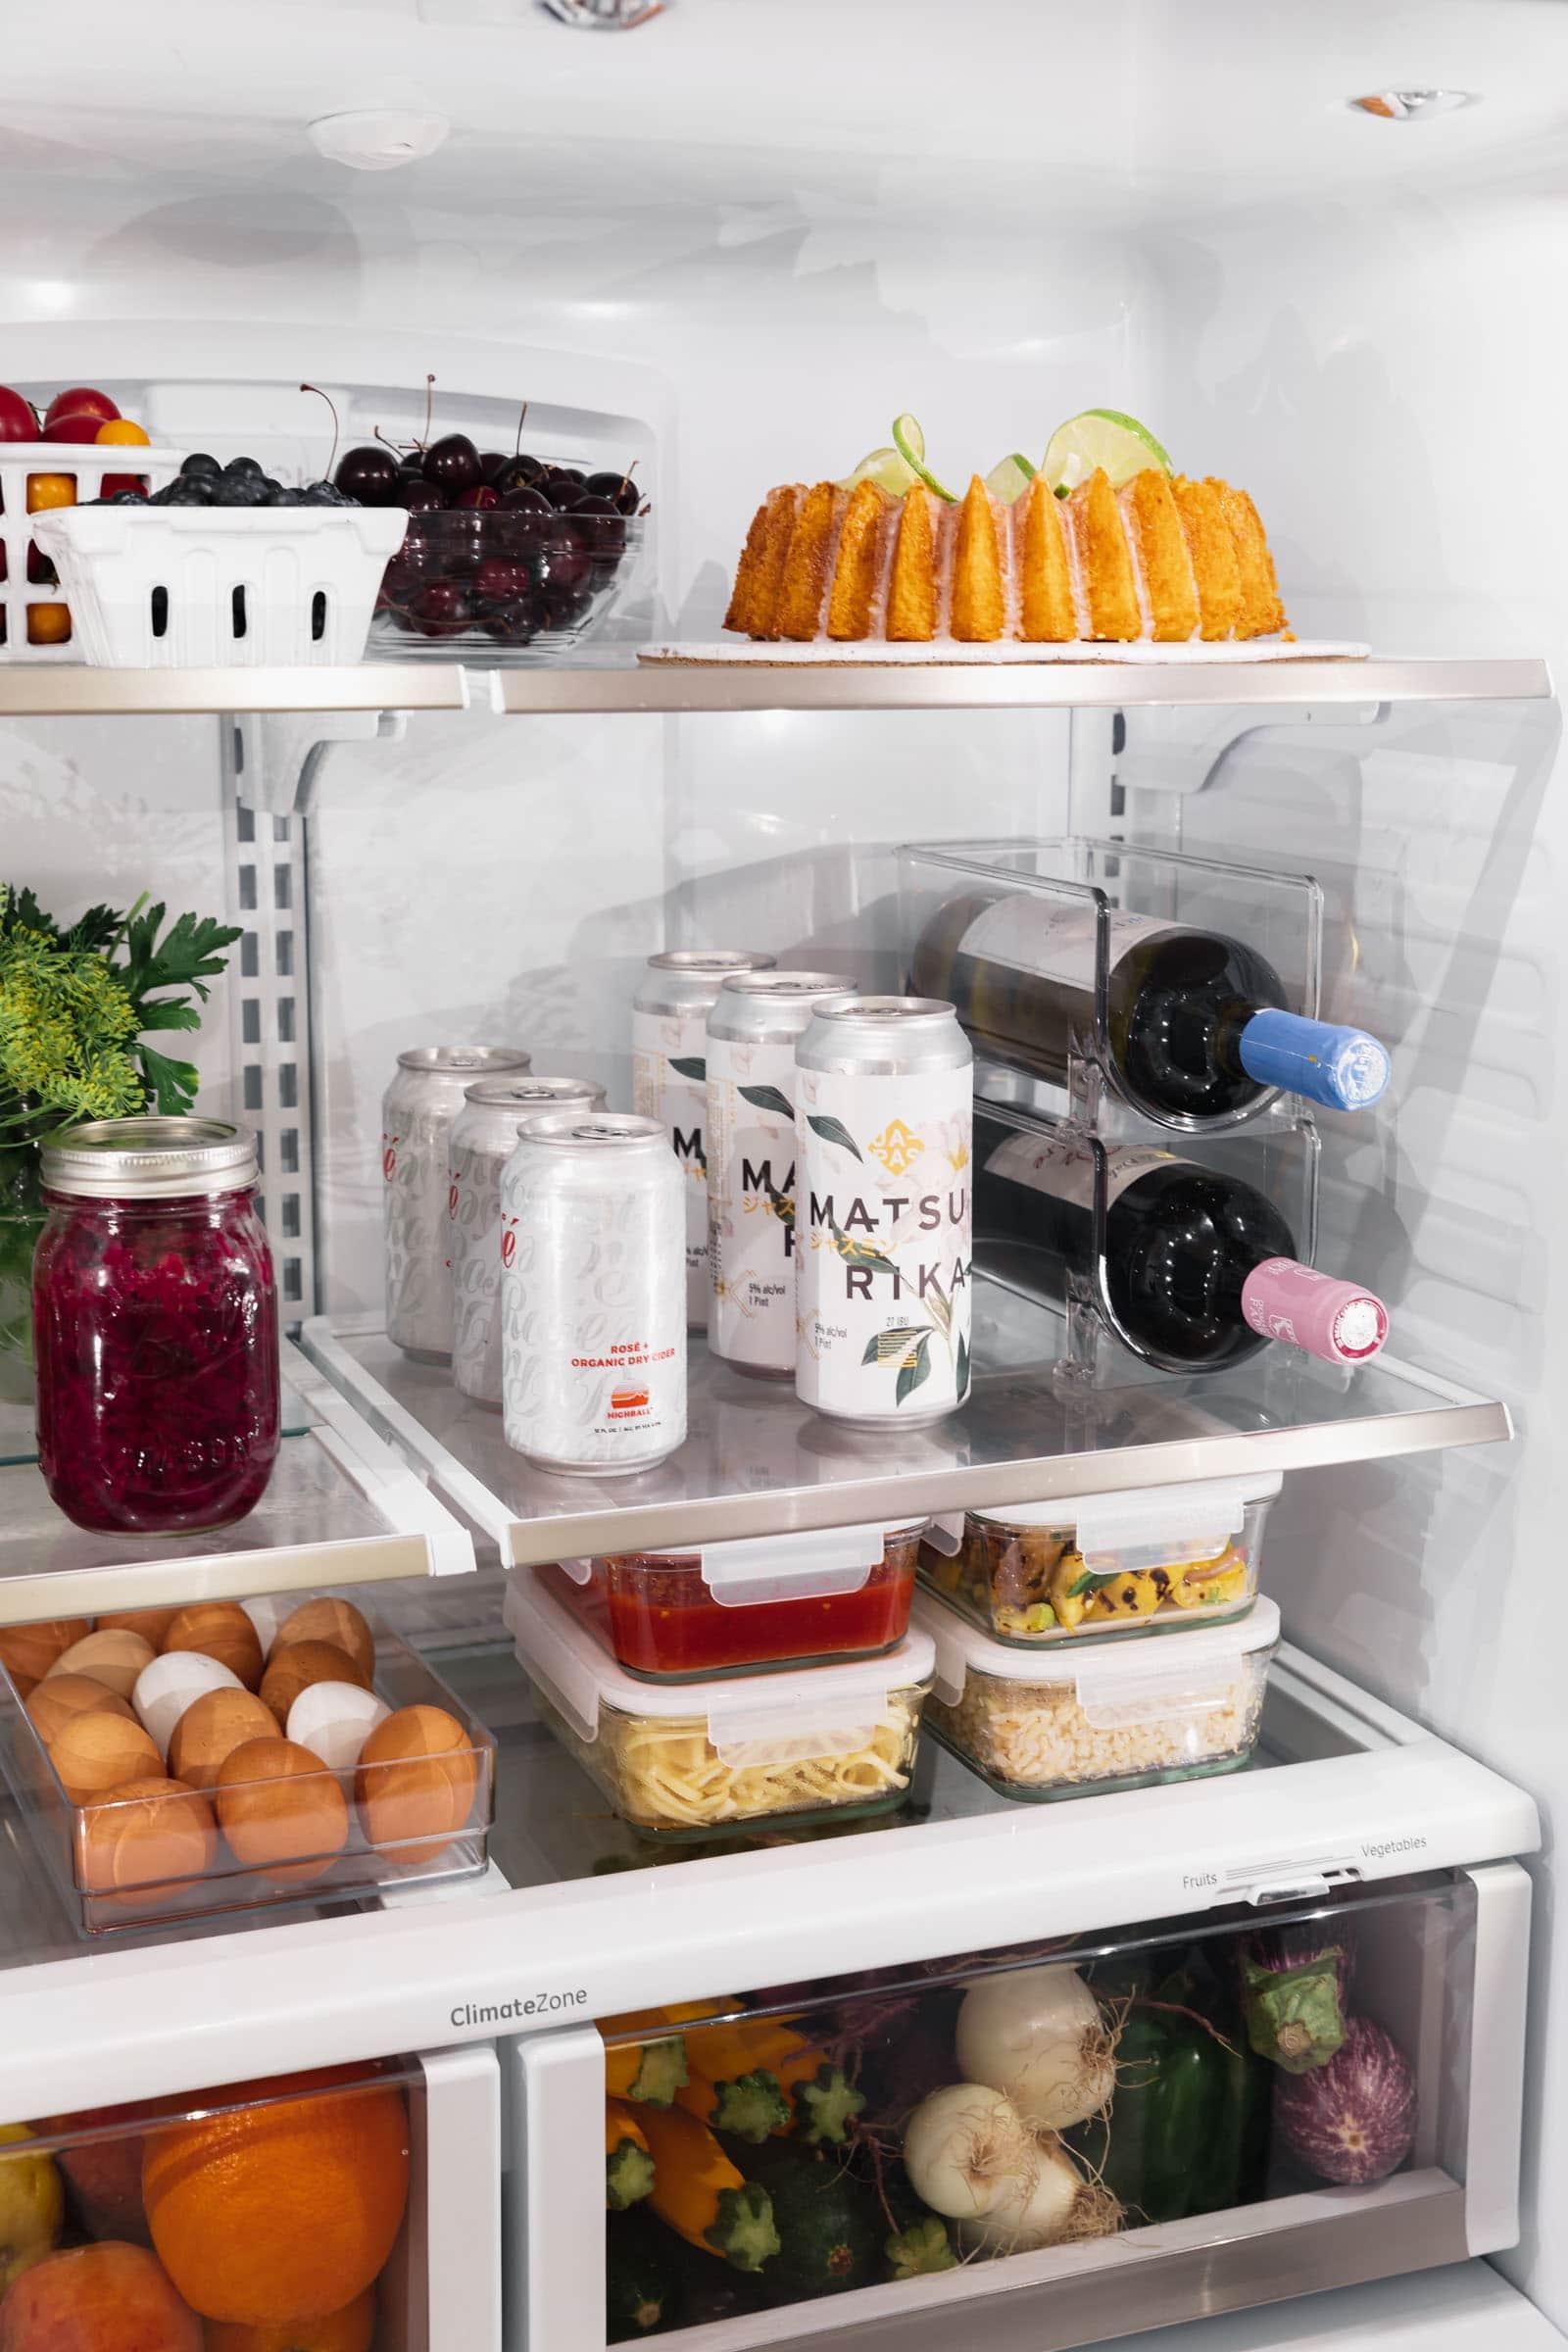 fridge organization in a Cafe Appliances refrigerator